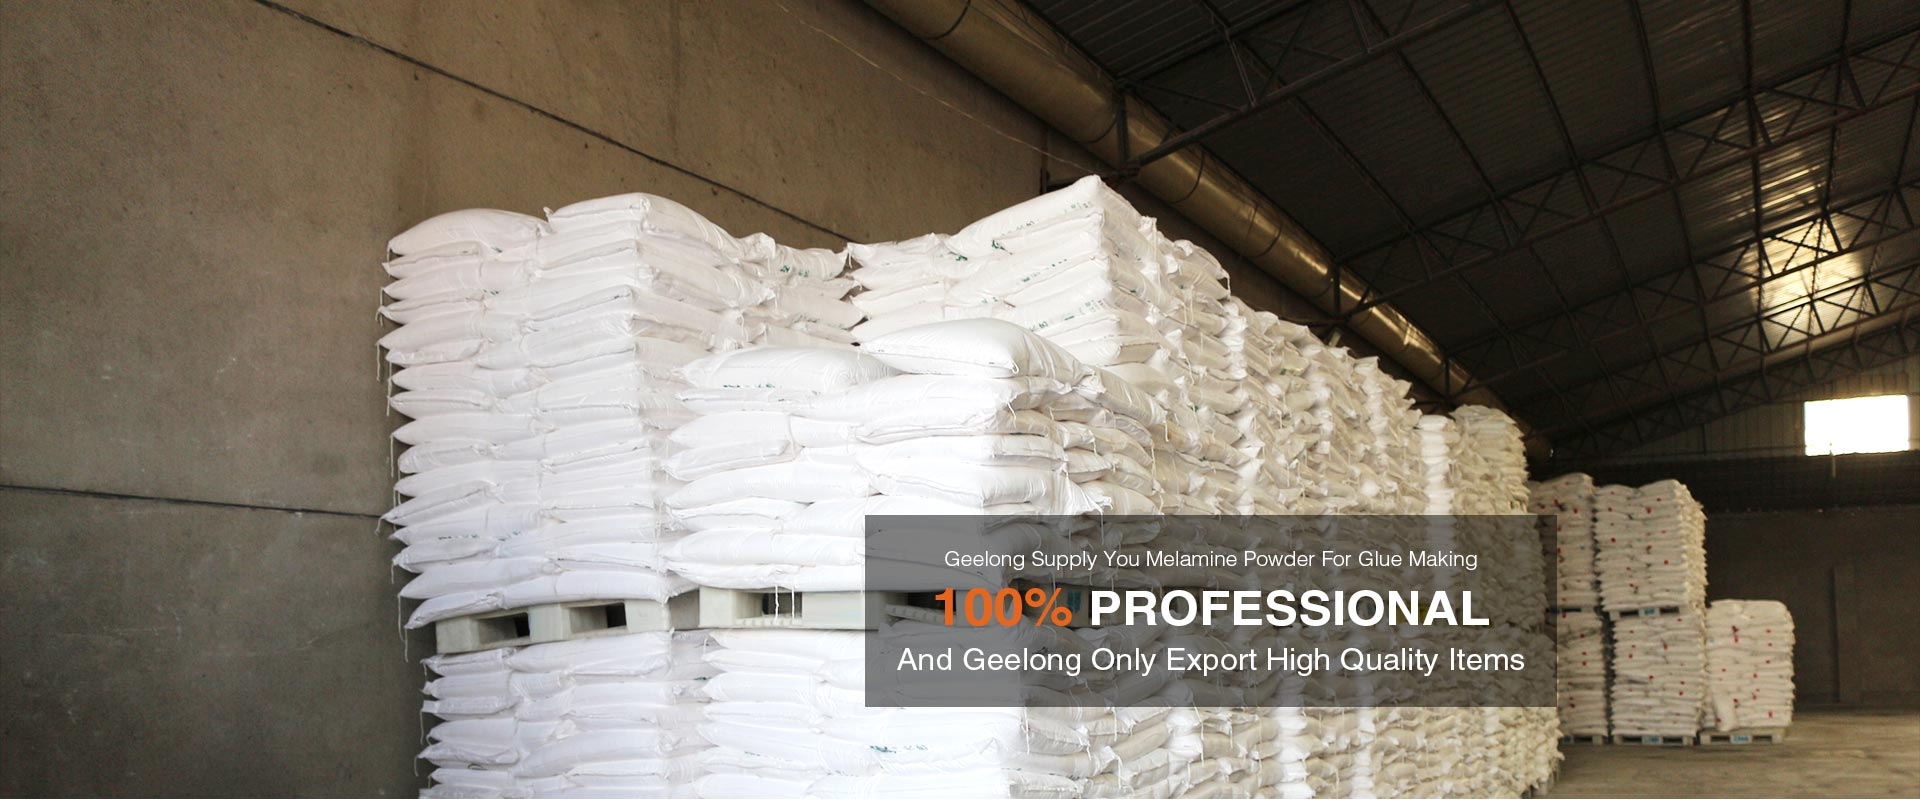 Geelong Supply Melamine Powder for Glue Making